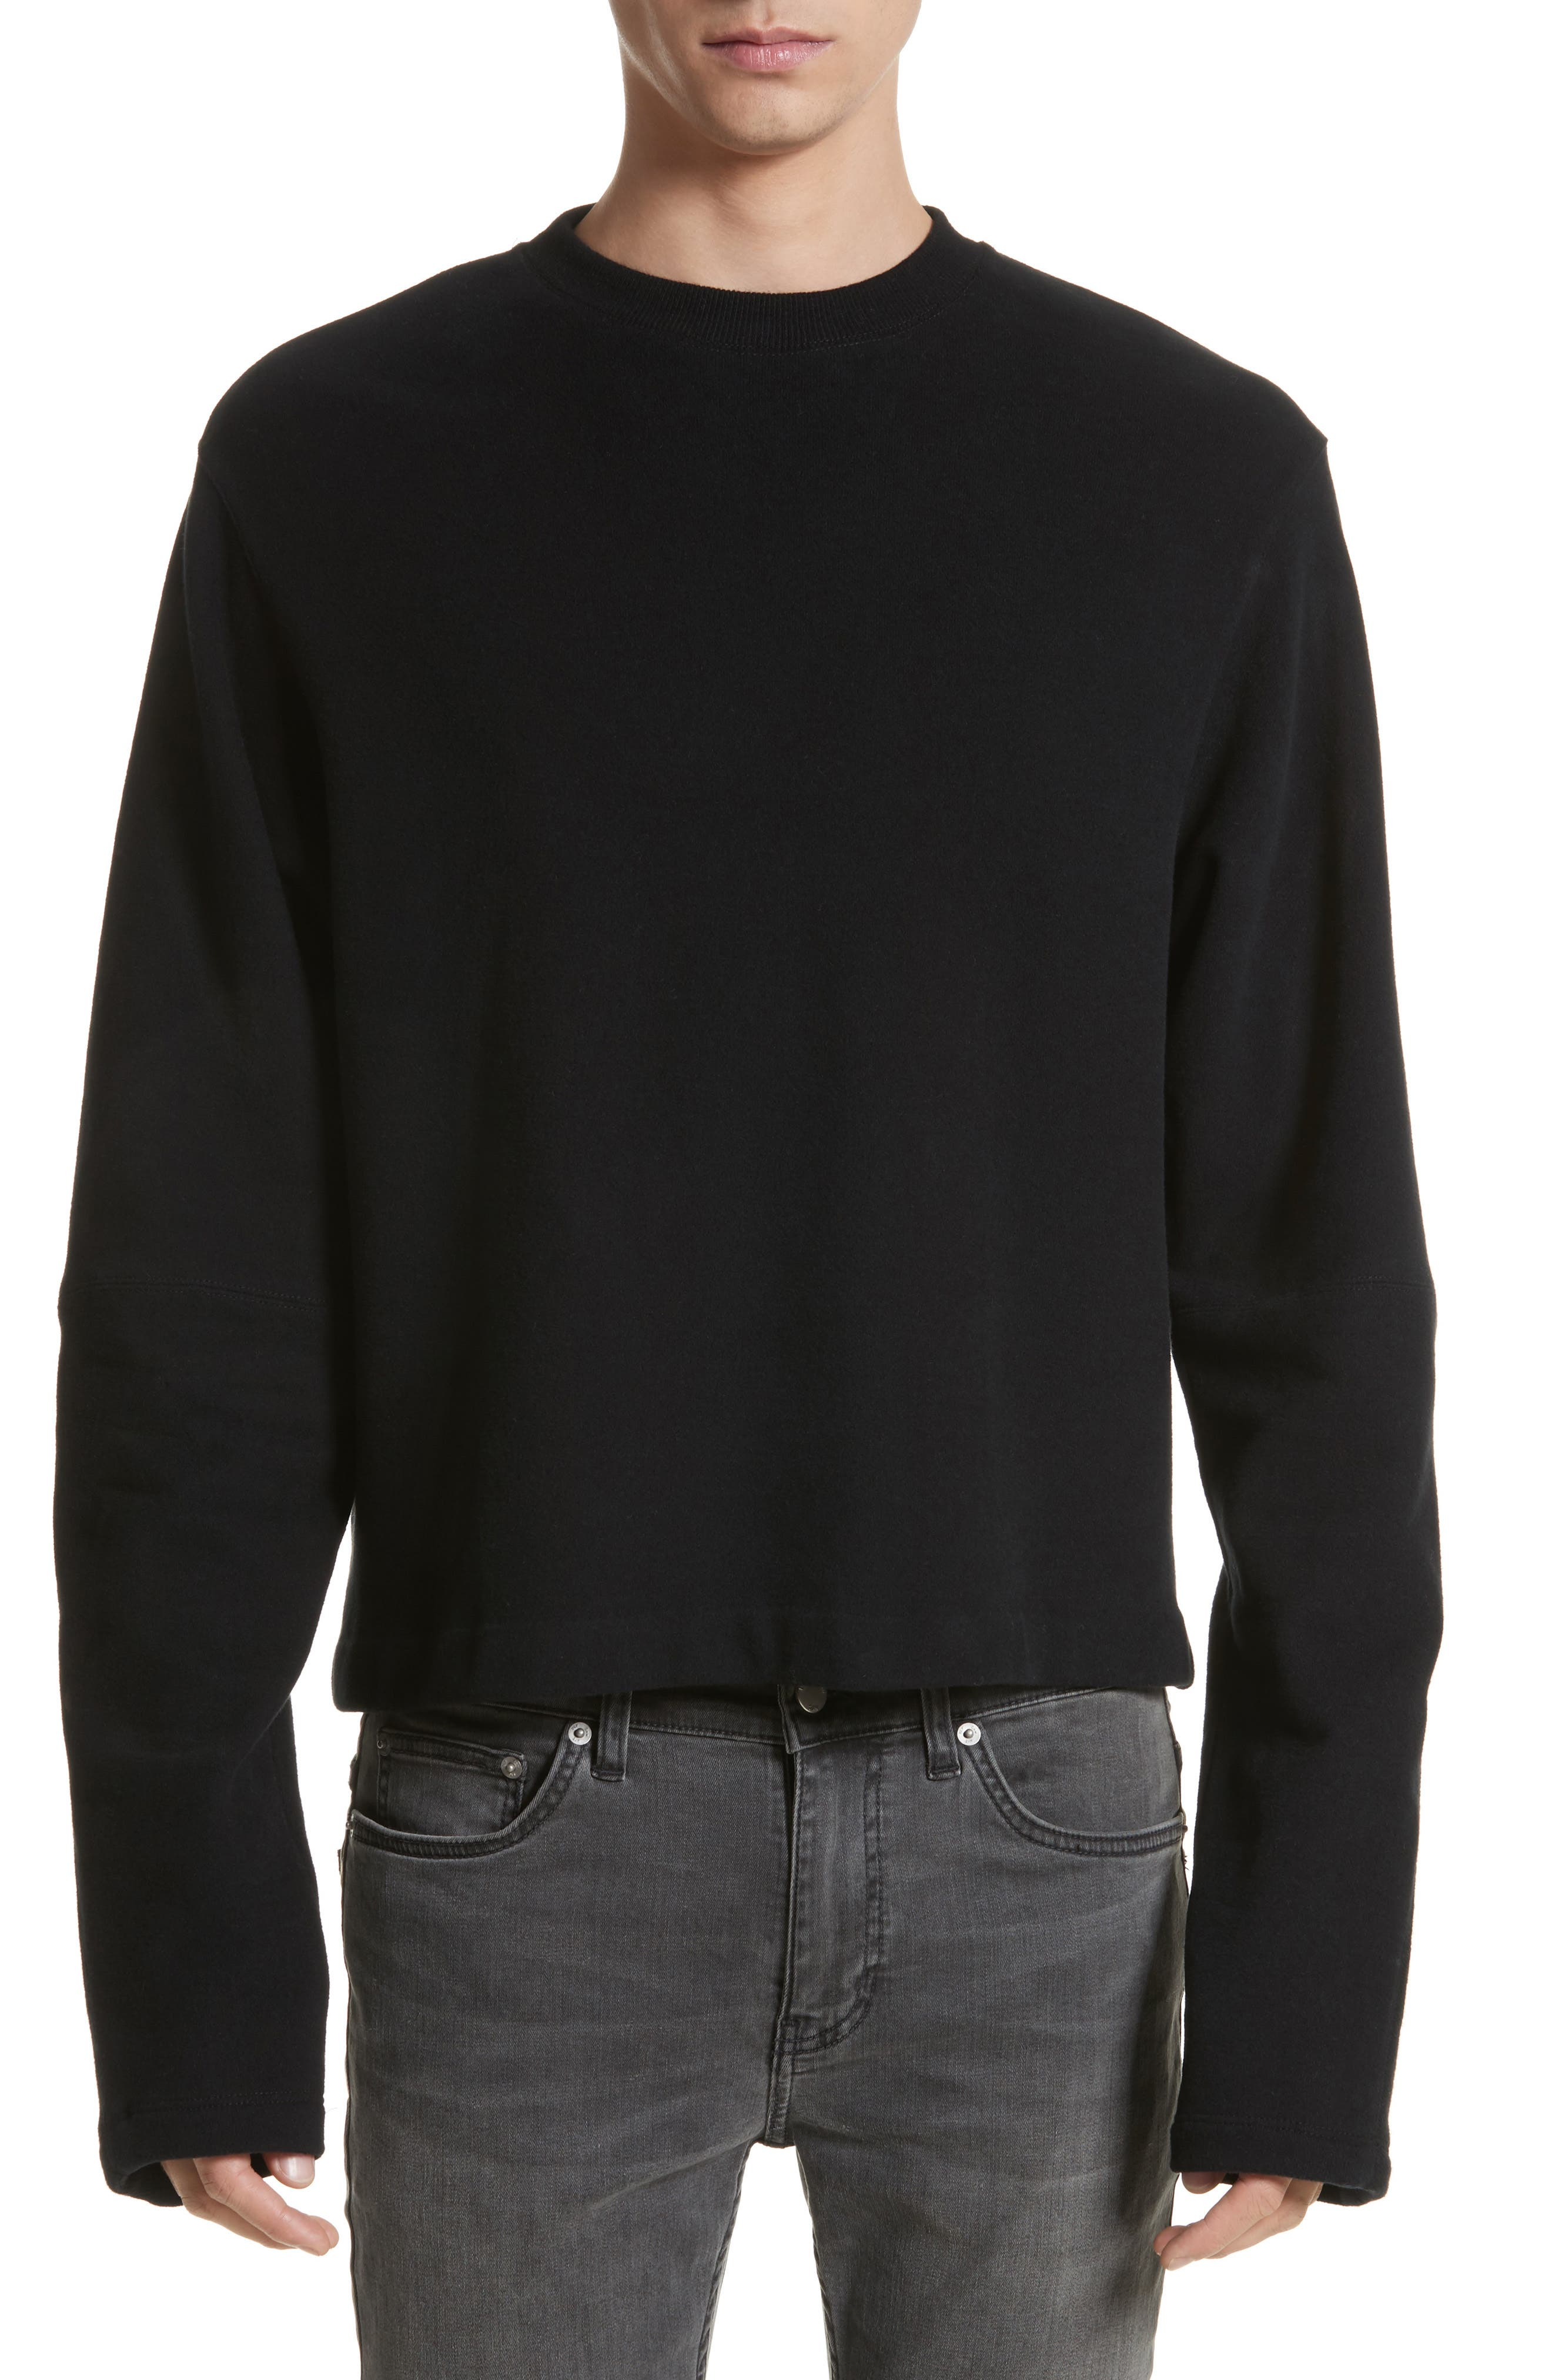 Main Image - Helmut Lang Rib Detail Crewneck Sweater